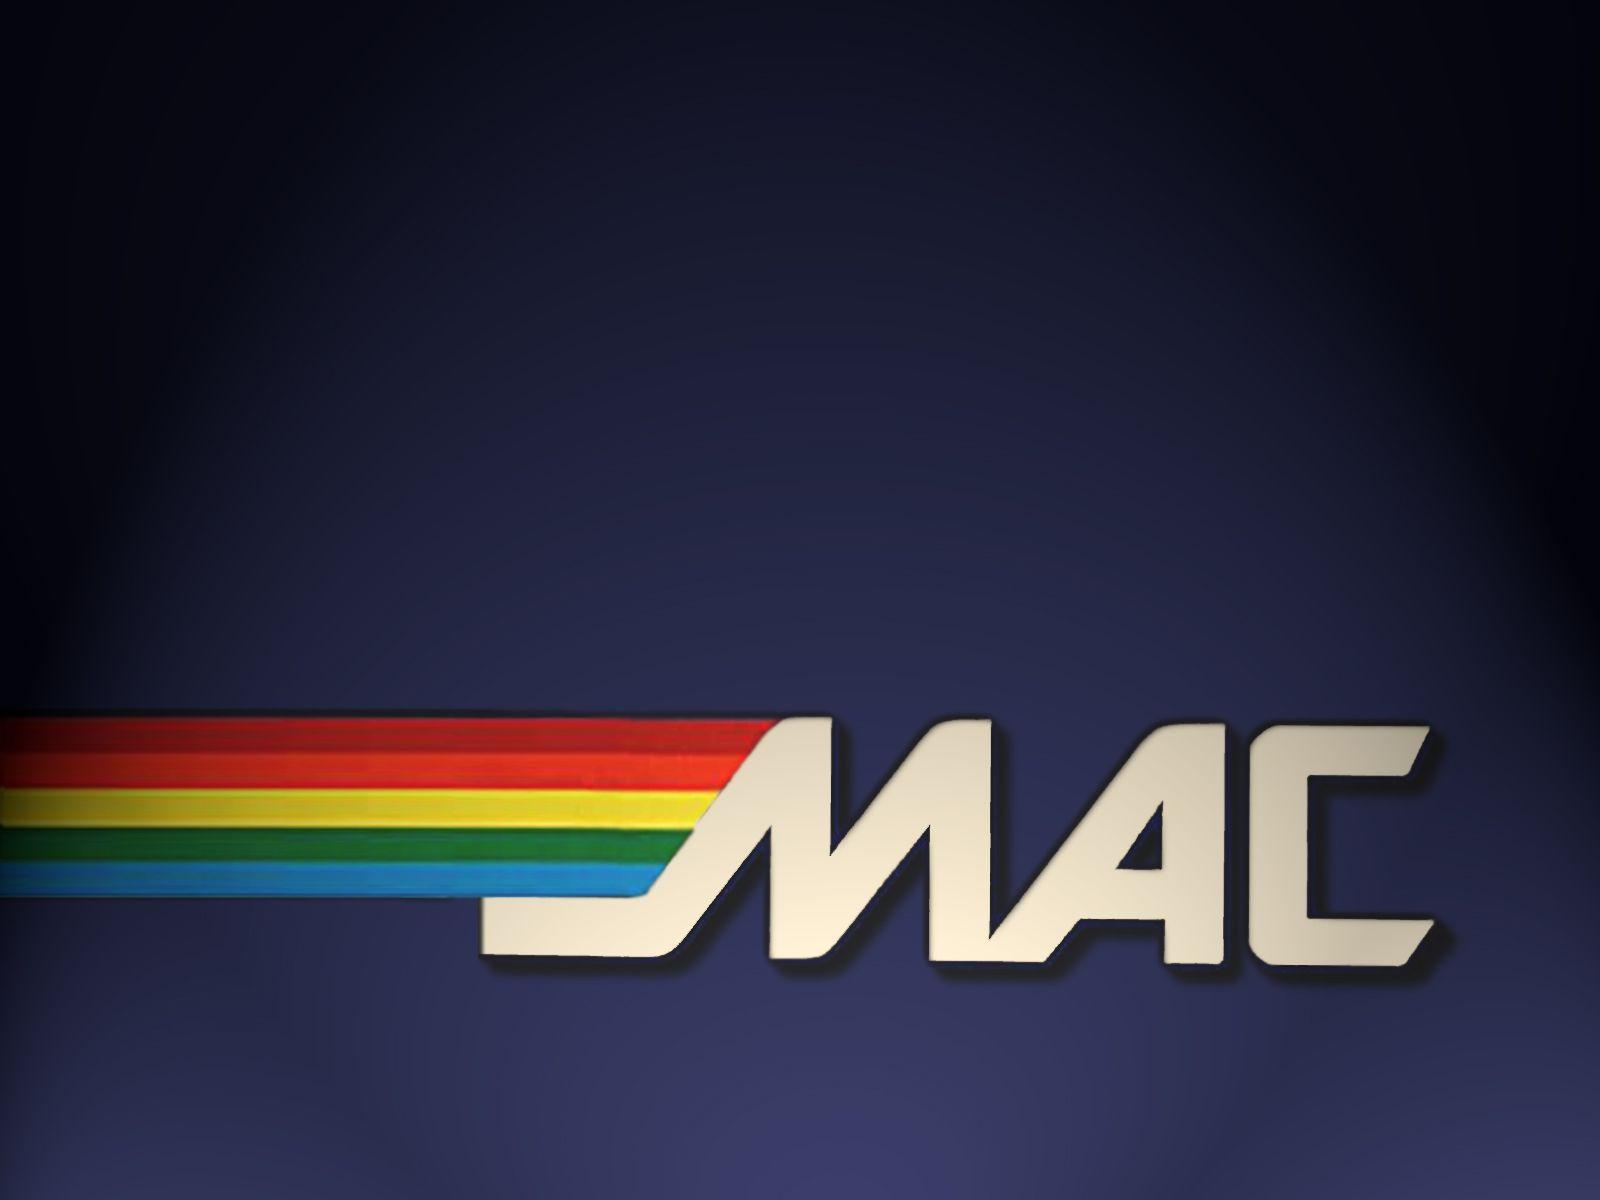 Retro Apple Mac Wallpaper - Apple Desktop - HD Wallpaper